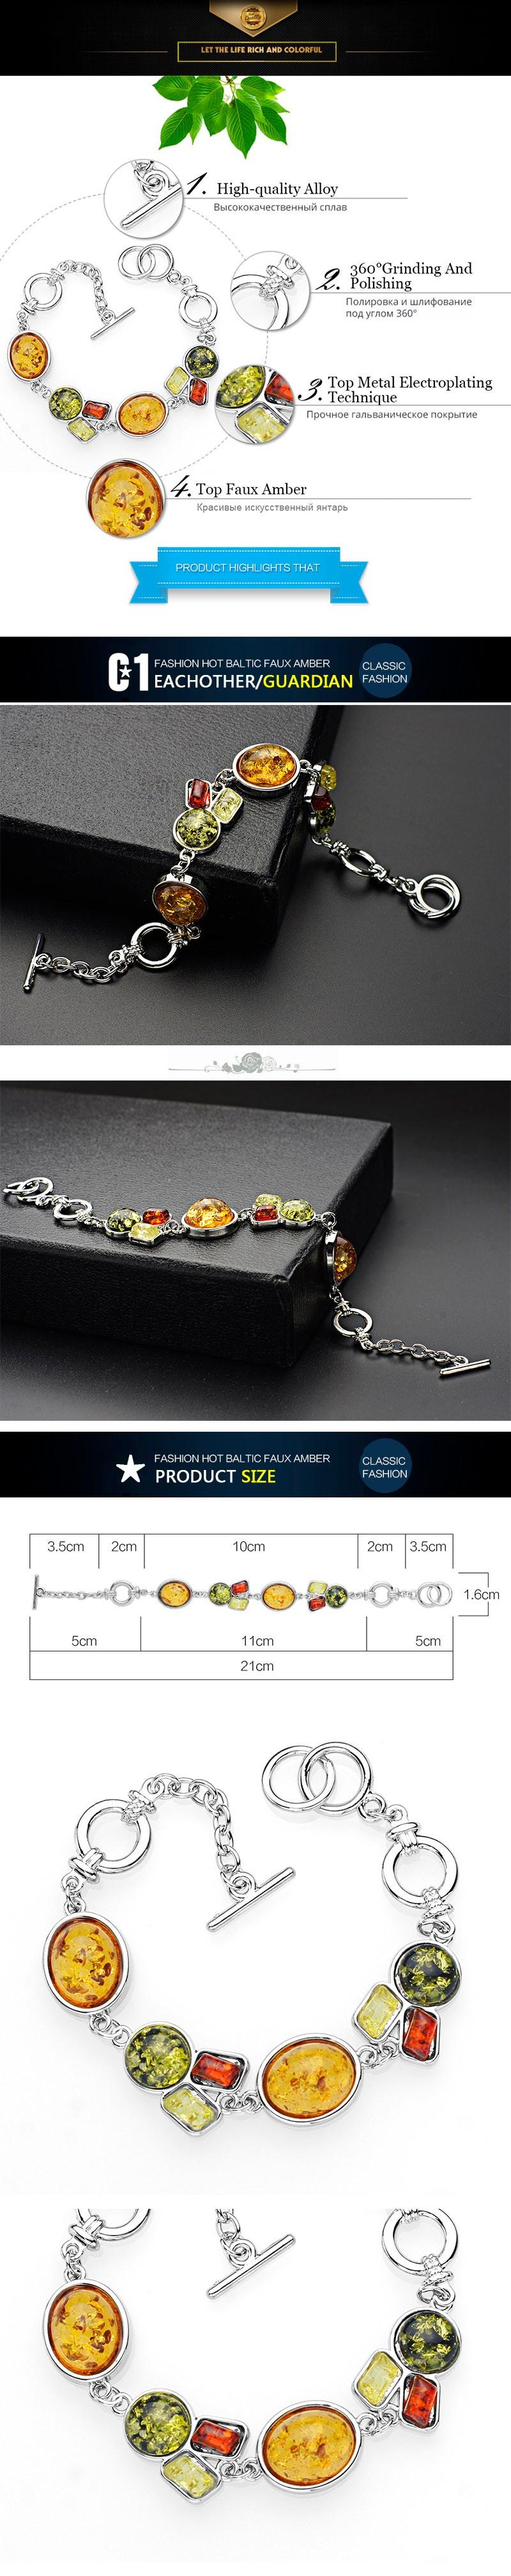 Charm Oval Round Synthetic Honey Baltic Bracelets & Bangles Link Chain Multicolor Bracelets For Women L83601 2